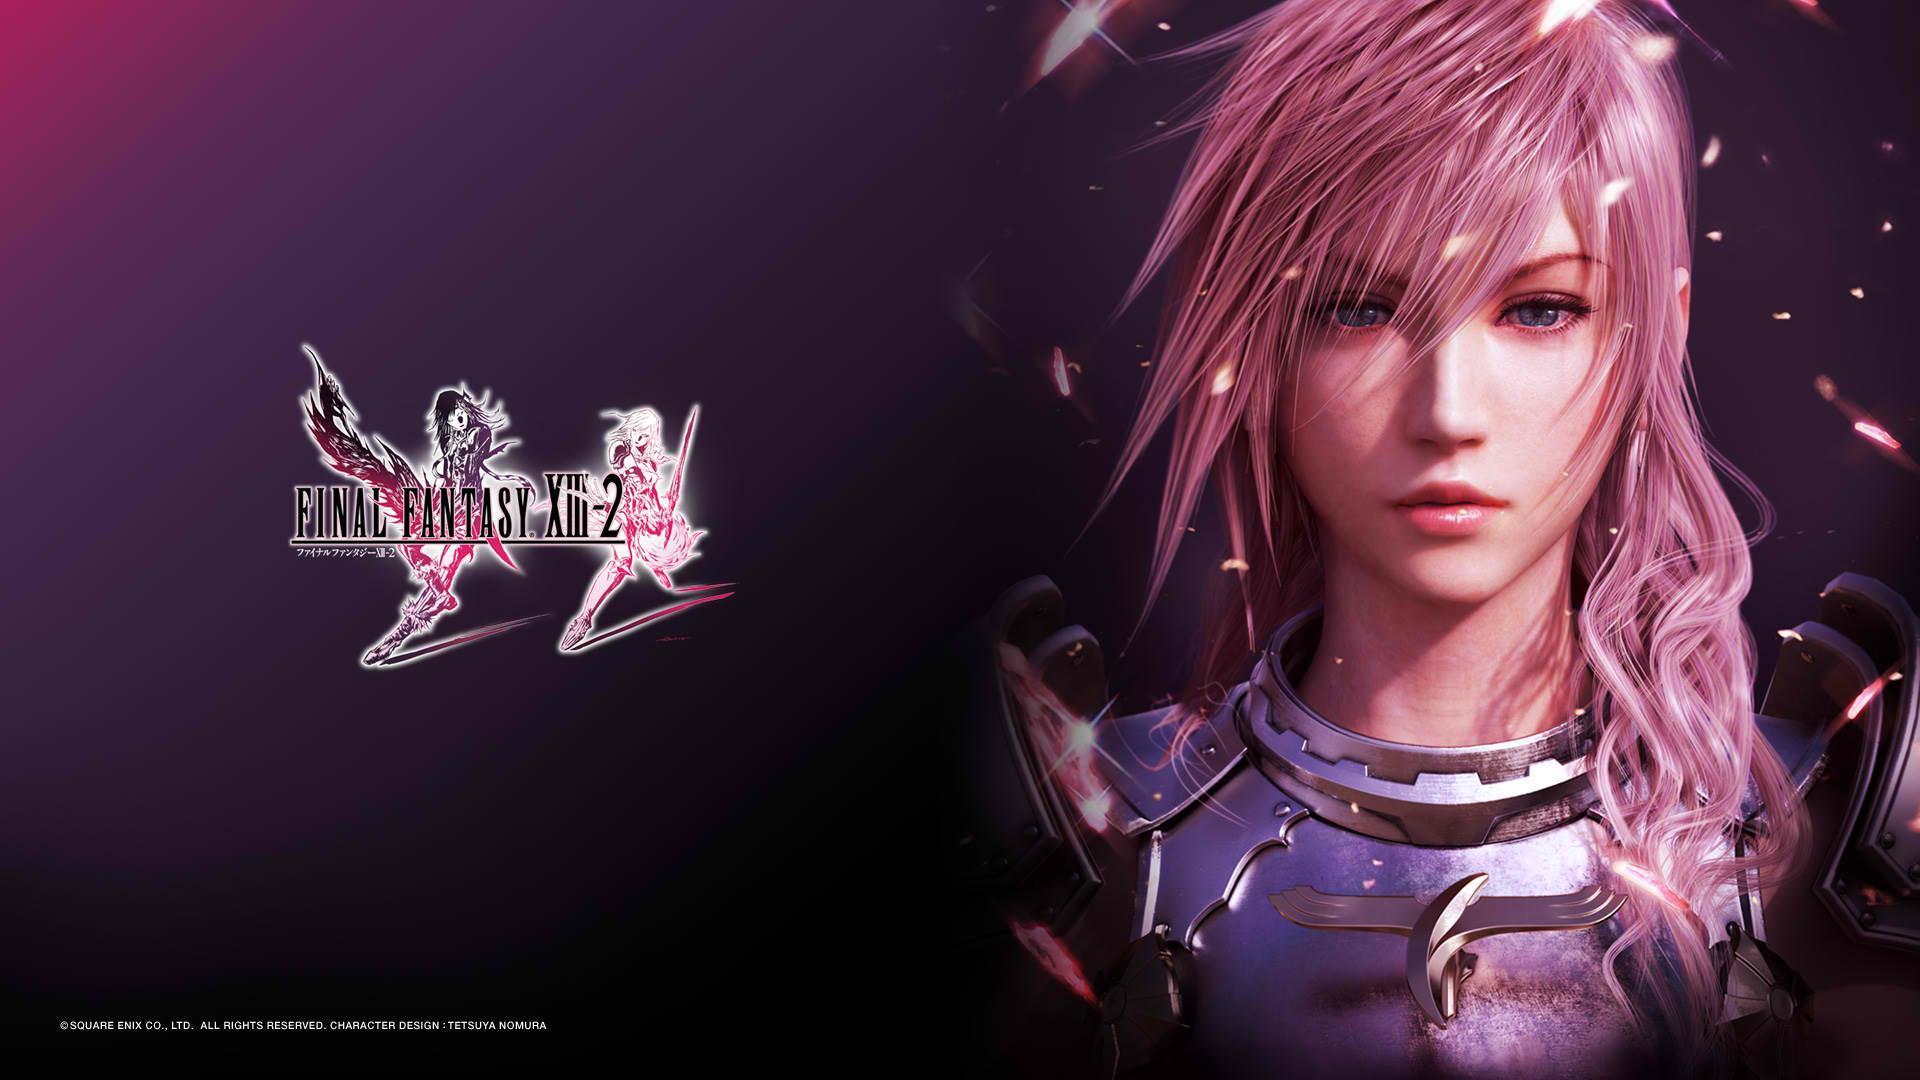 Lightning Final Fantasy Wallpapers - Wallpaper Cave